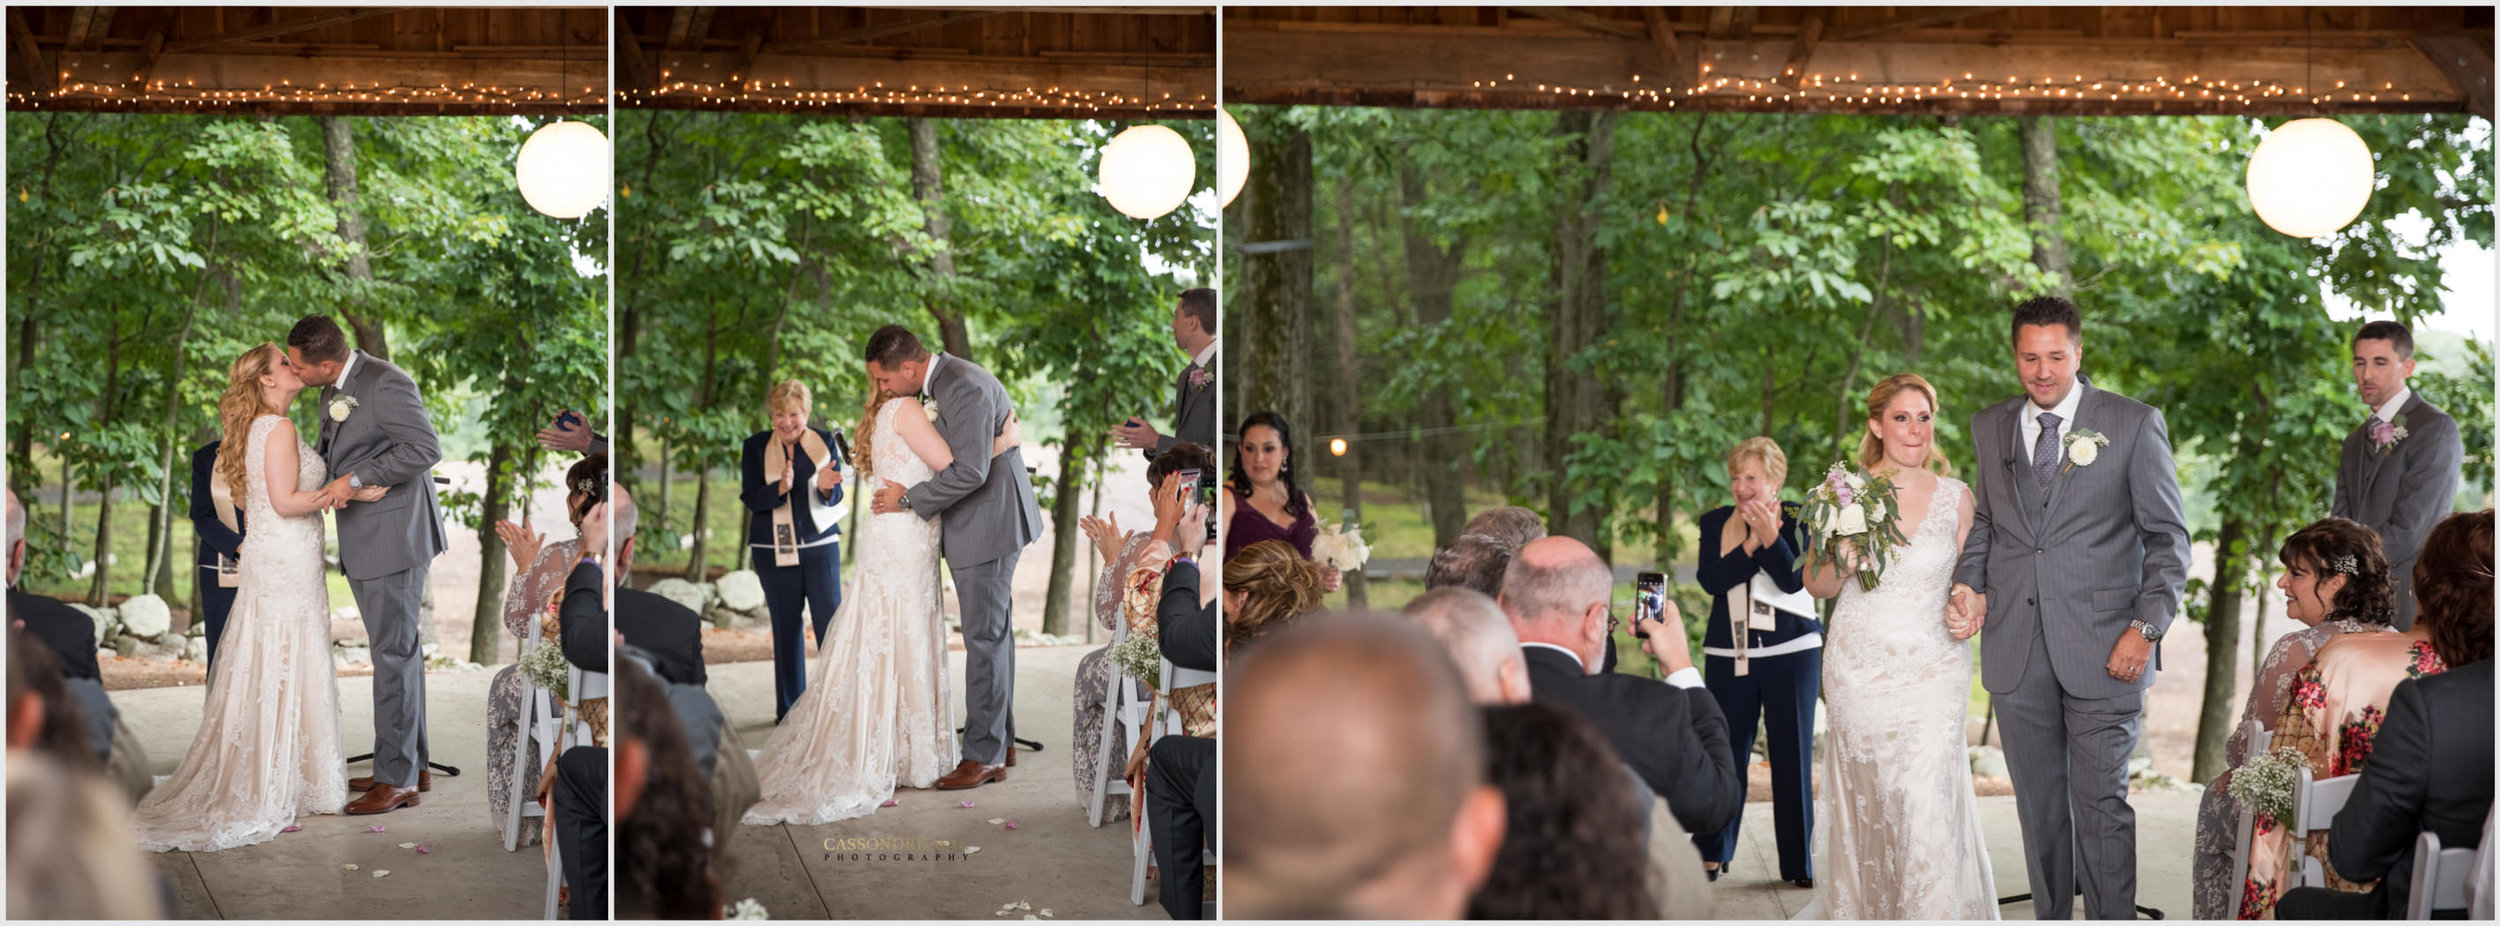 Cassondre Mae Photography Emmerich Tree Farm Wedding 18.jpg